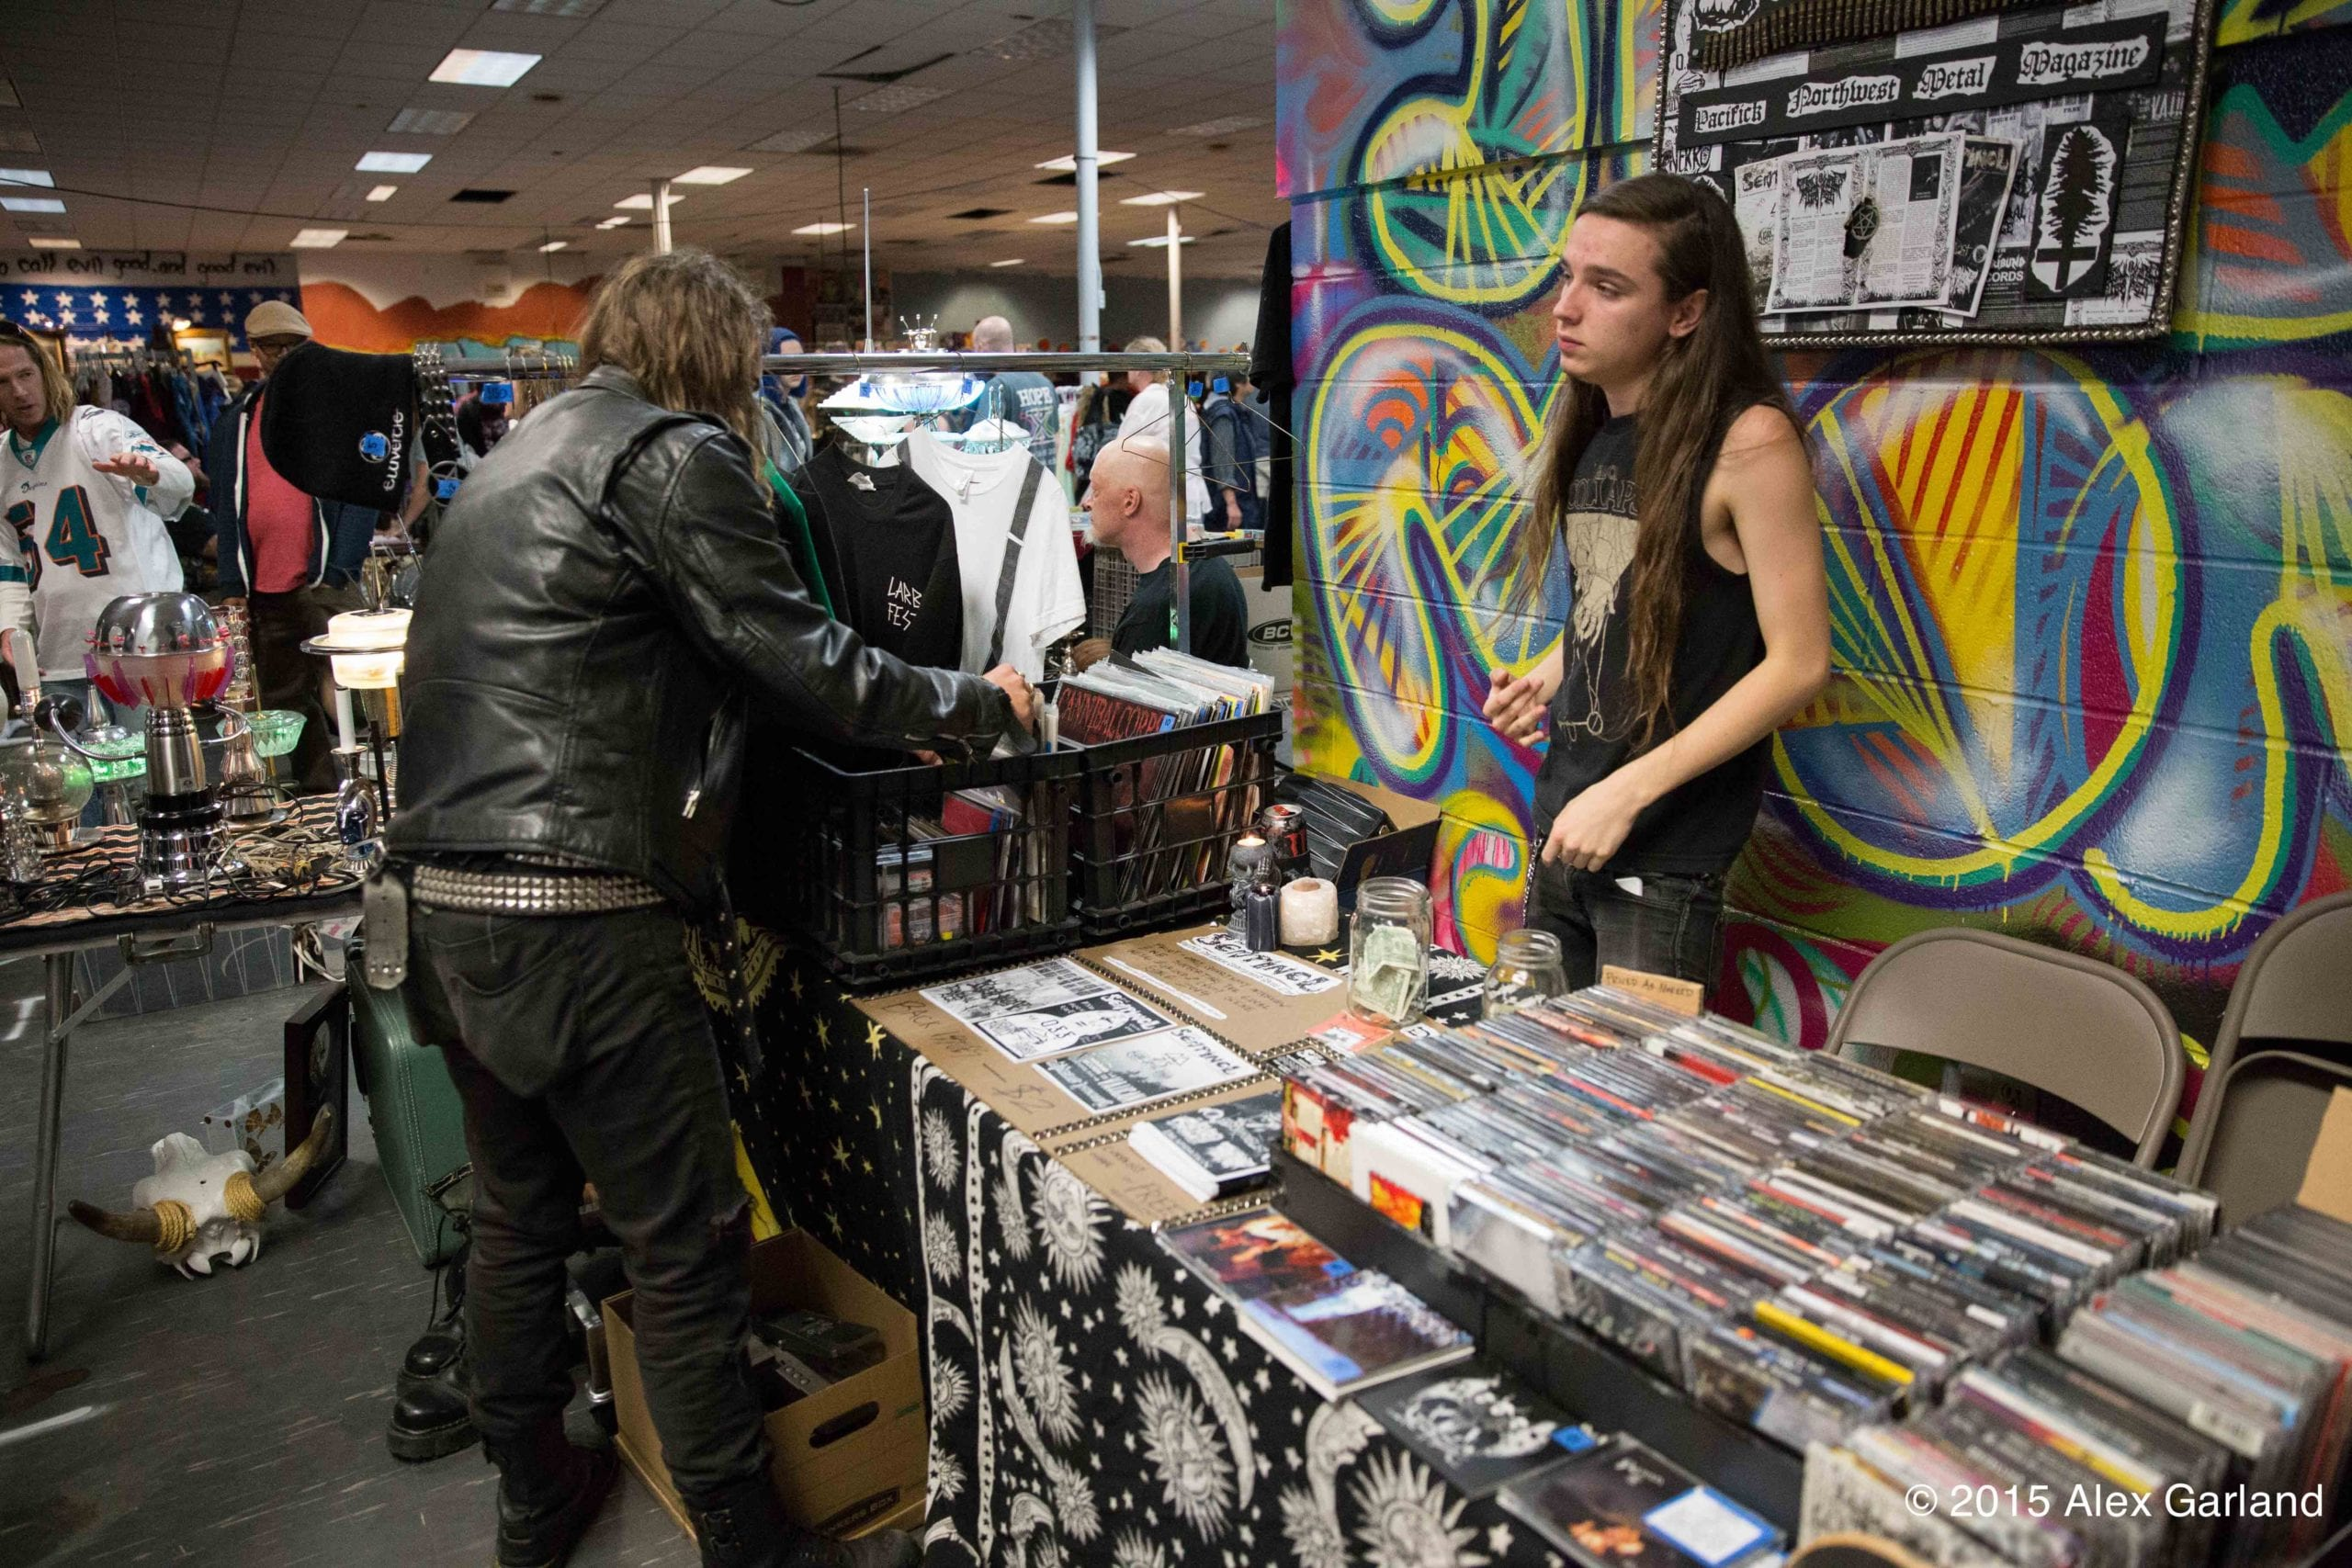 Chs Pics Punk Rock Flea Market At The Punk Rock Post Office Chs Capitol Hill Seattle